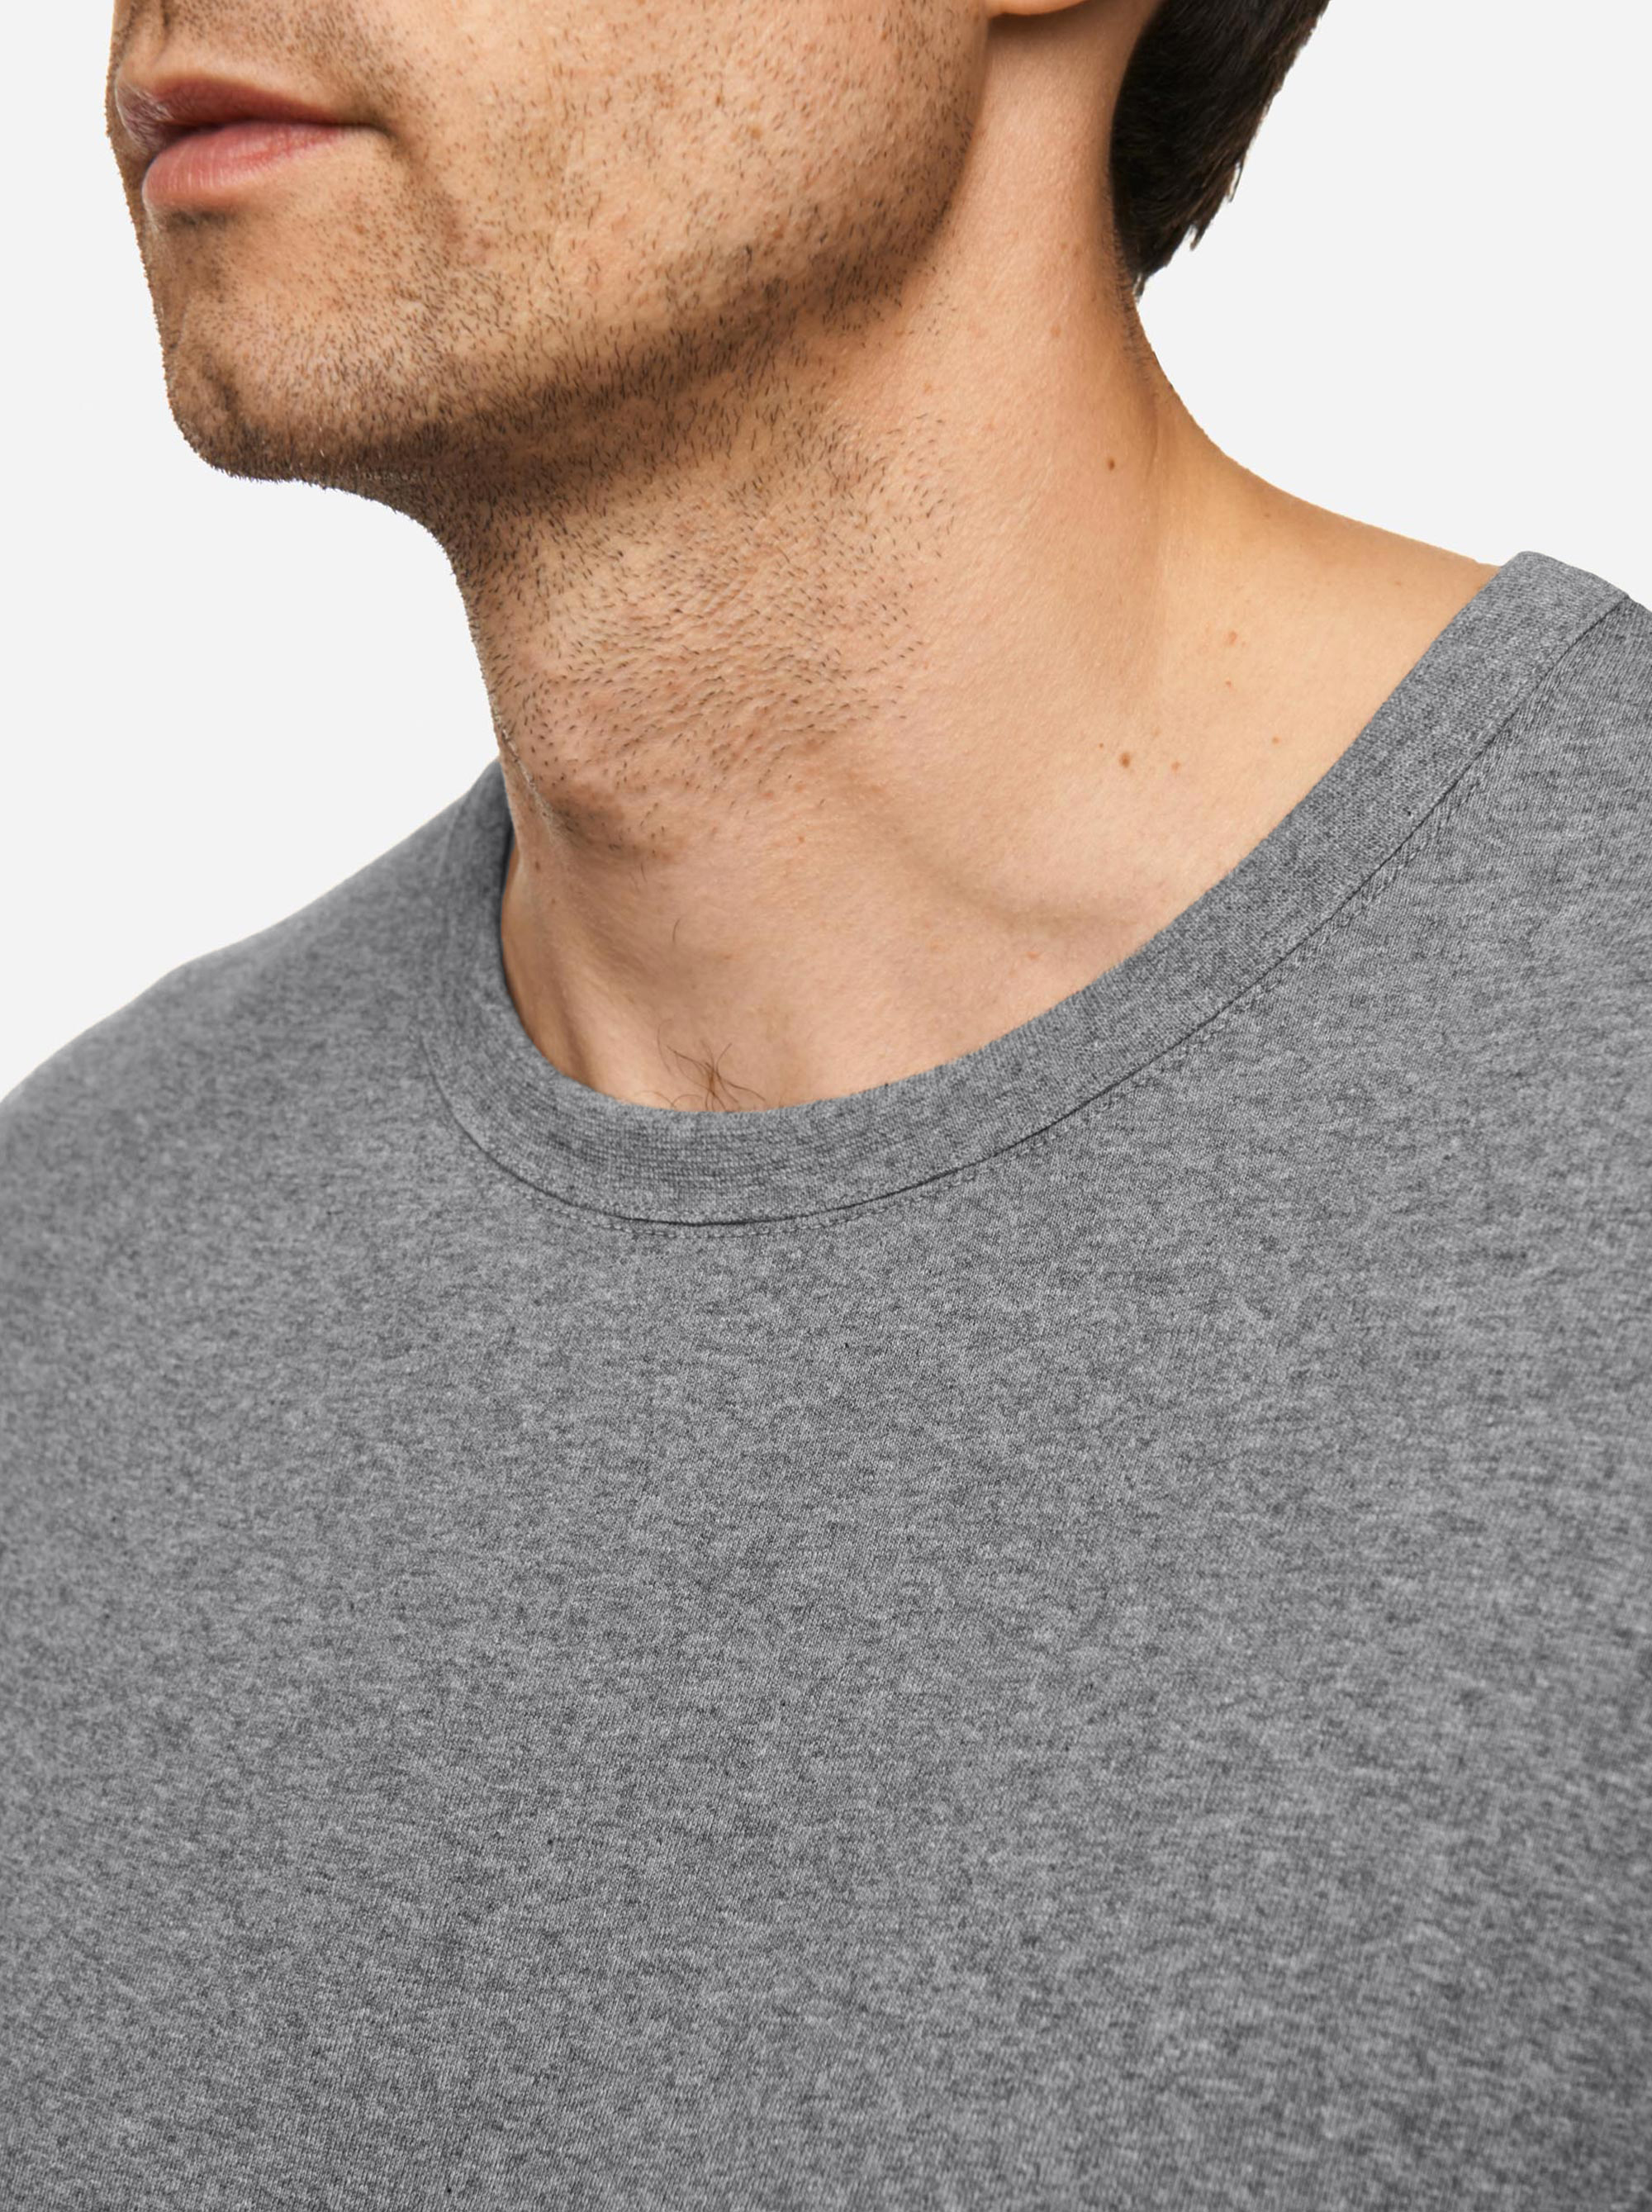 Teym - The-T-Shirt - Longsleeve - Men - Melange Grey - 1B